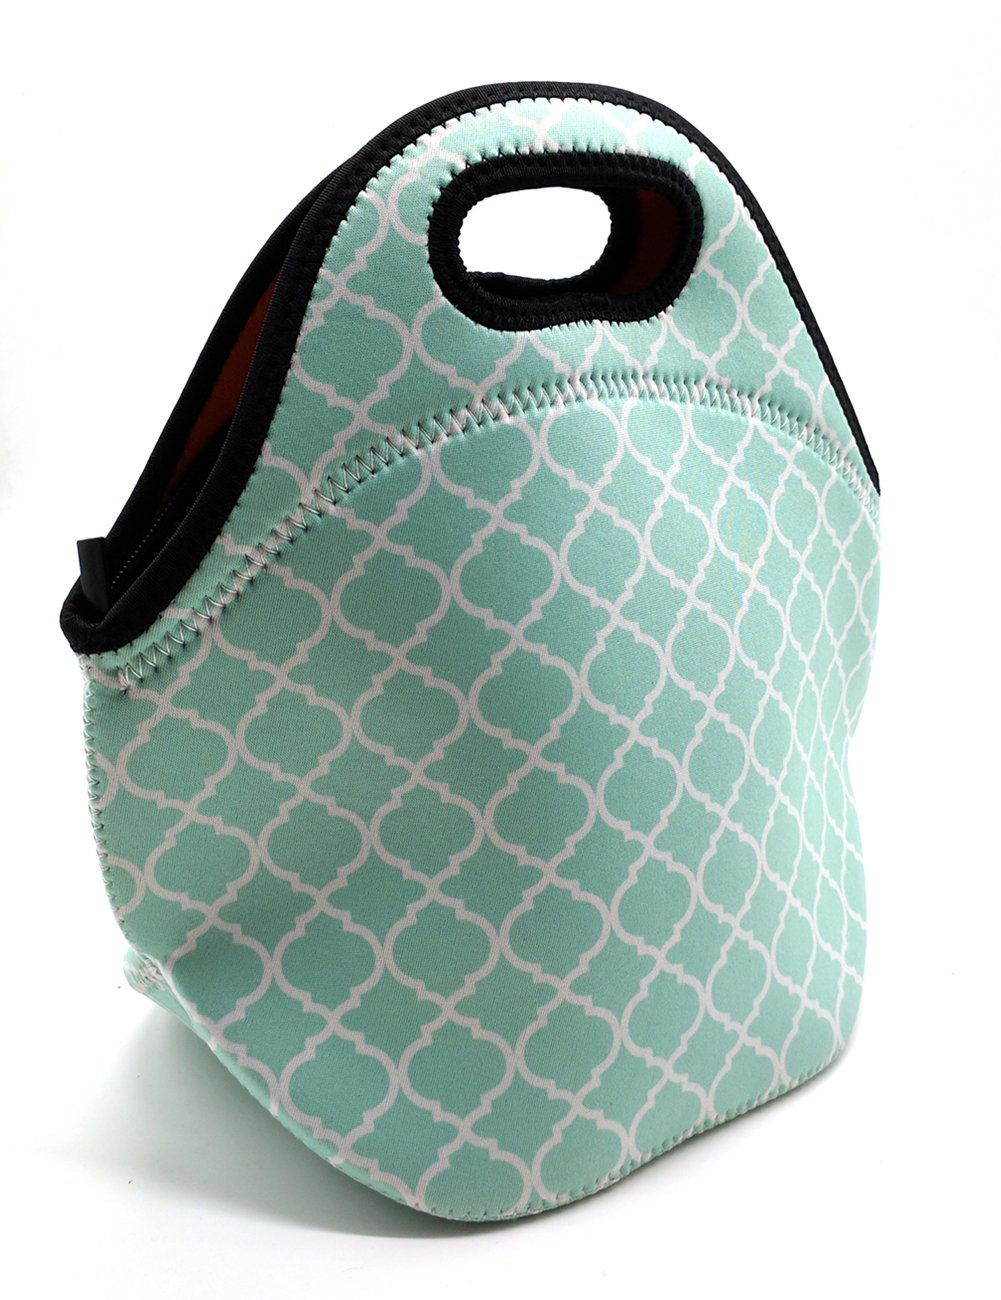 102cf059538d Buy ALLENLIFE Waterproof cute small neoprene lunch bag Insulated ...